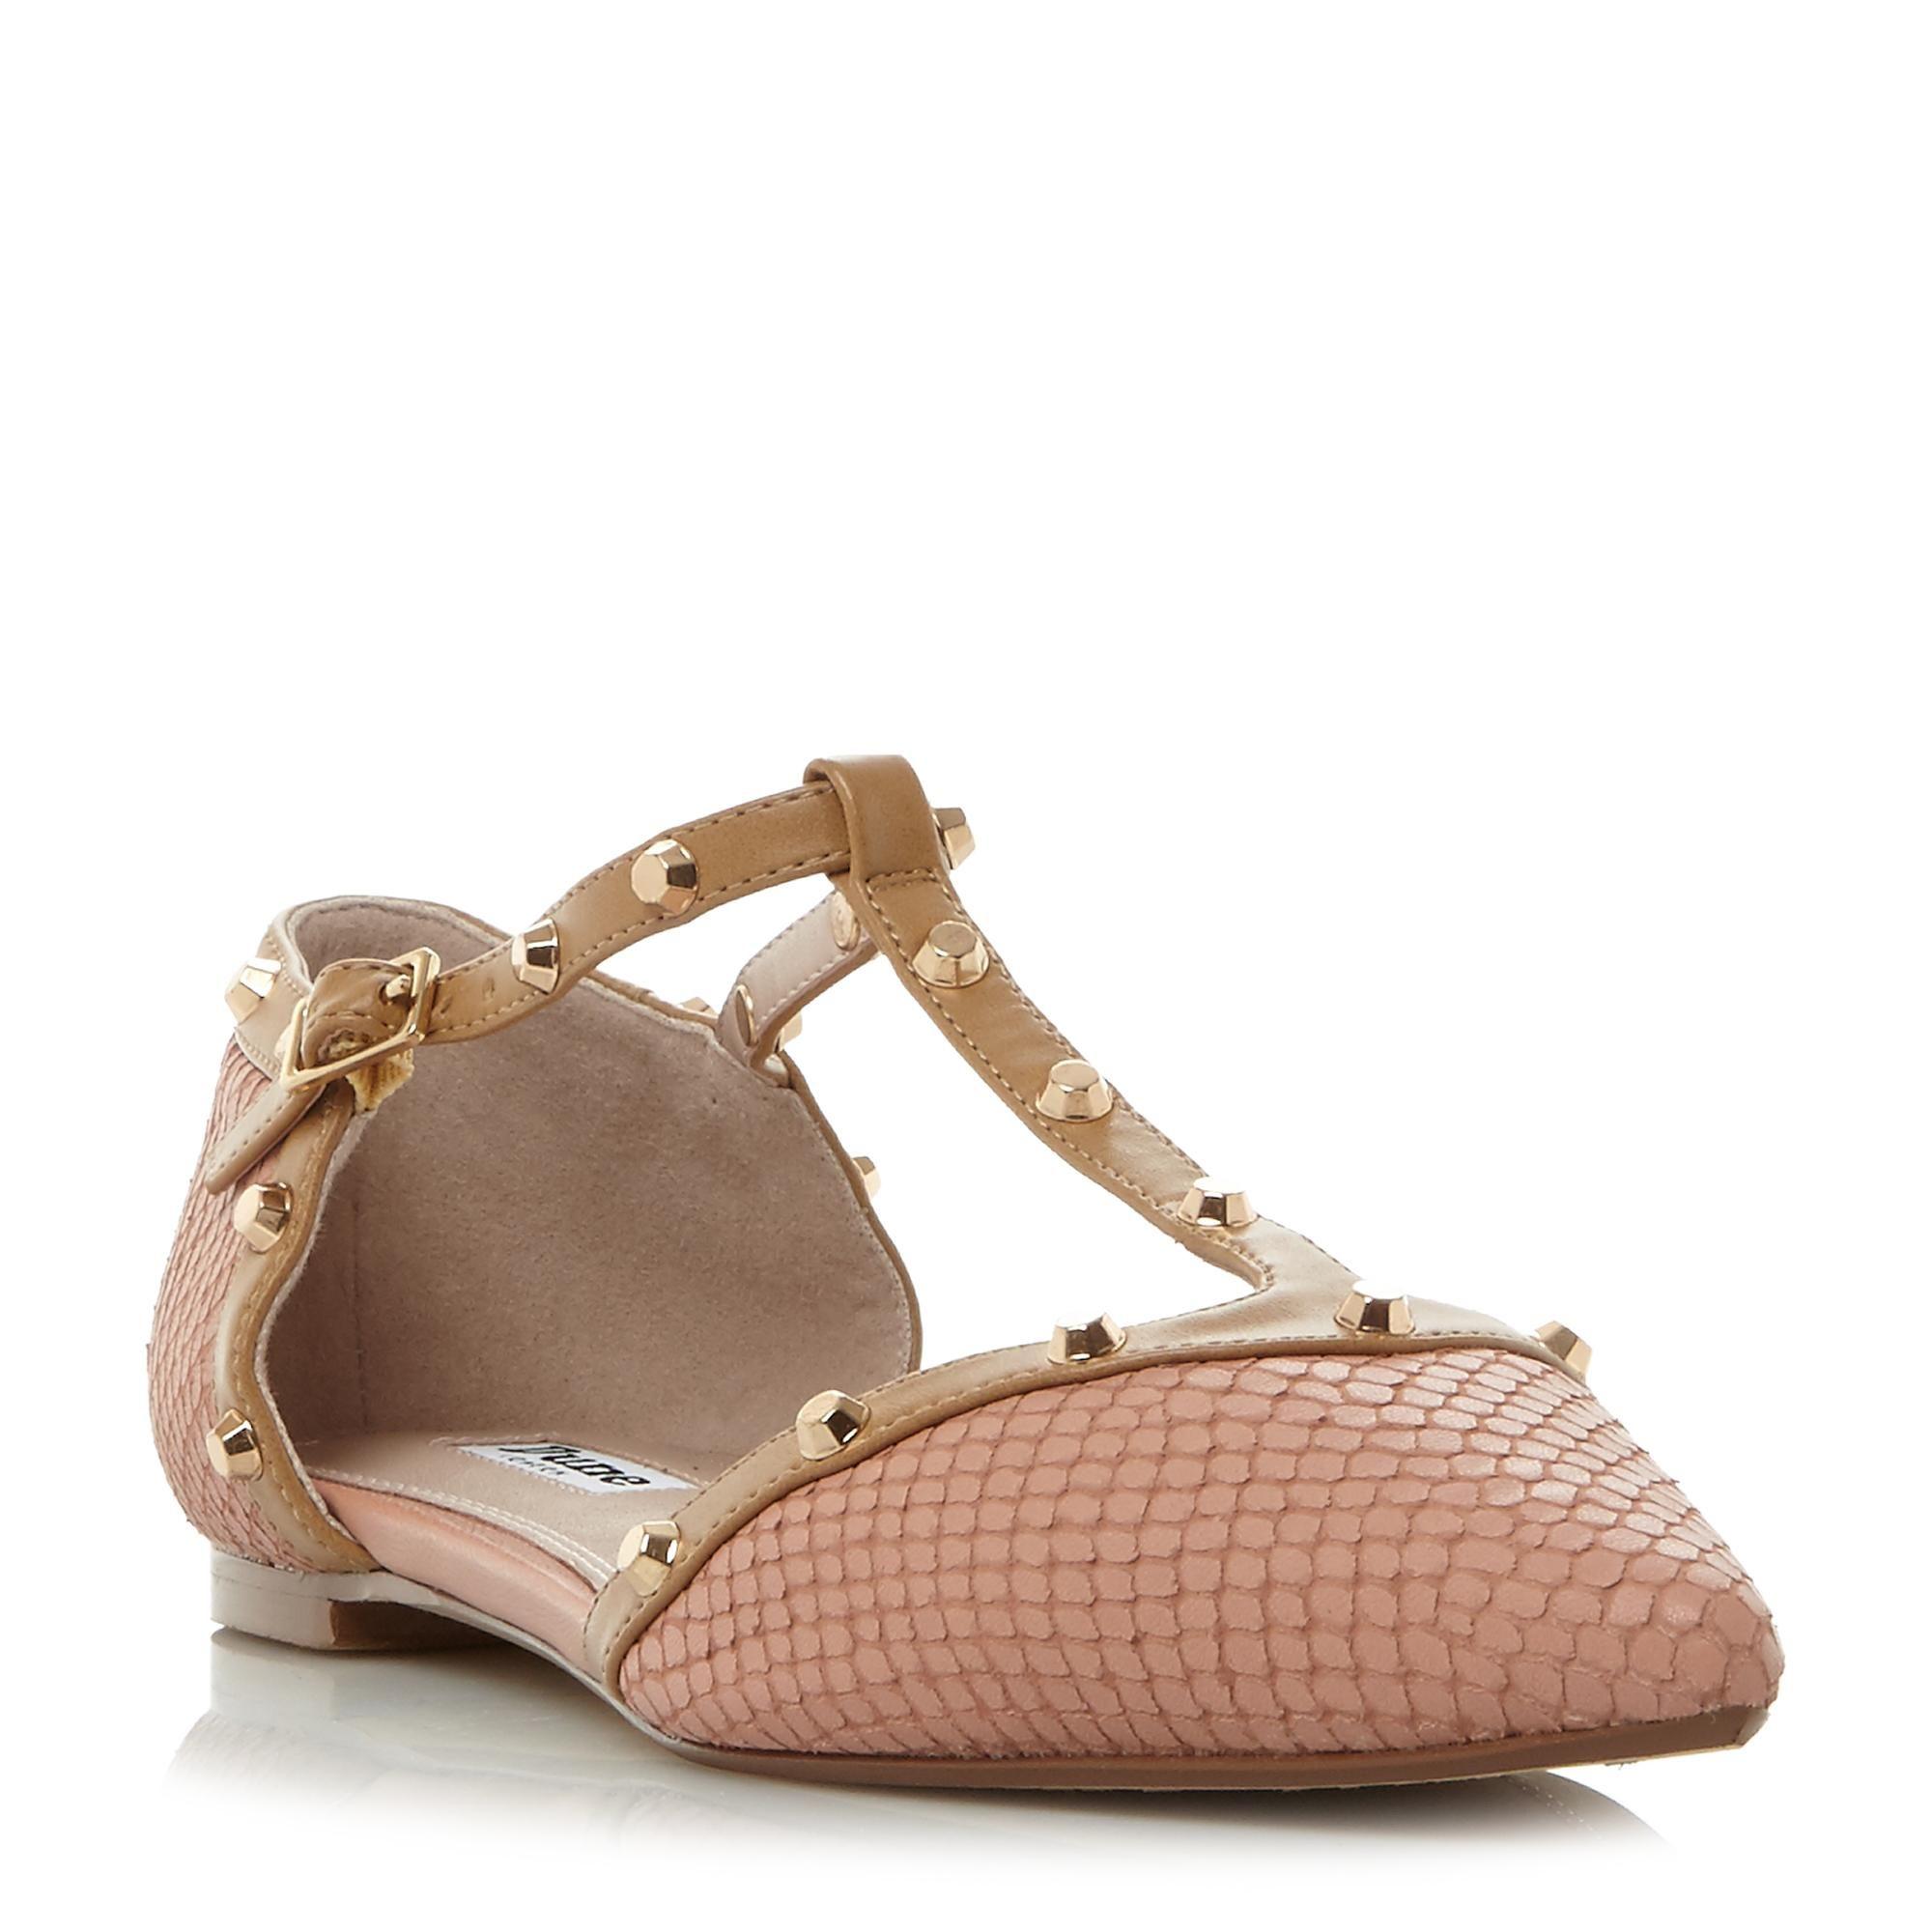 bc31c83c46 DUNE LADIES HETI - Stud Detail Pointed Flat Shoe - dusty pink | Dune Shoes  Online